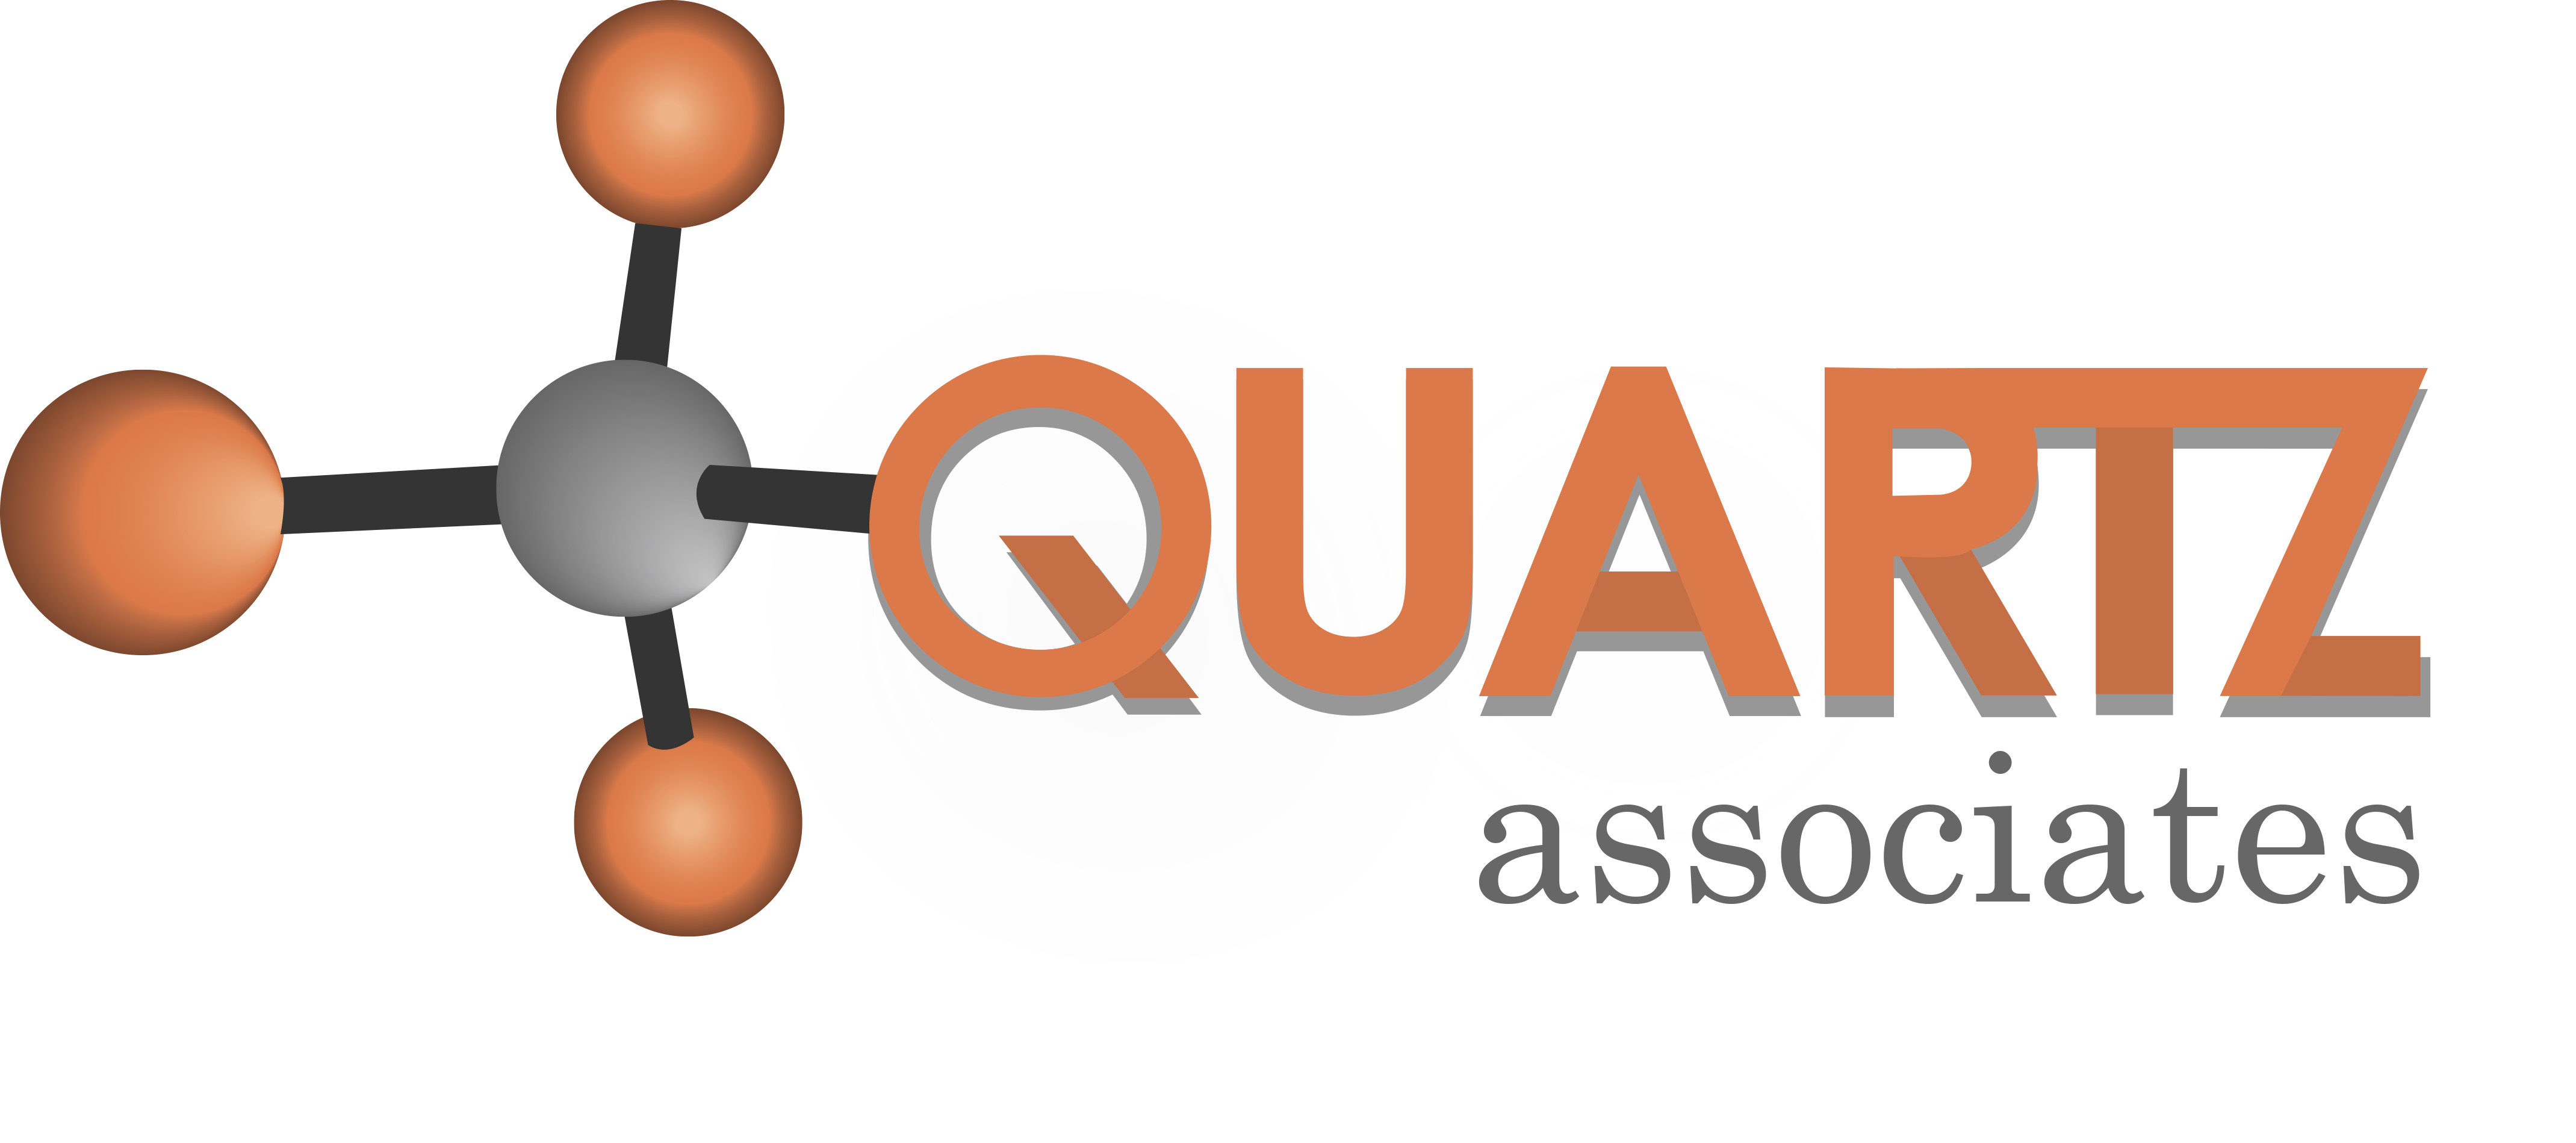 Get Help Quartz Ociates